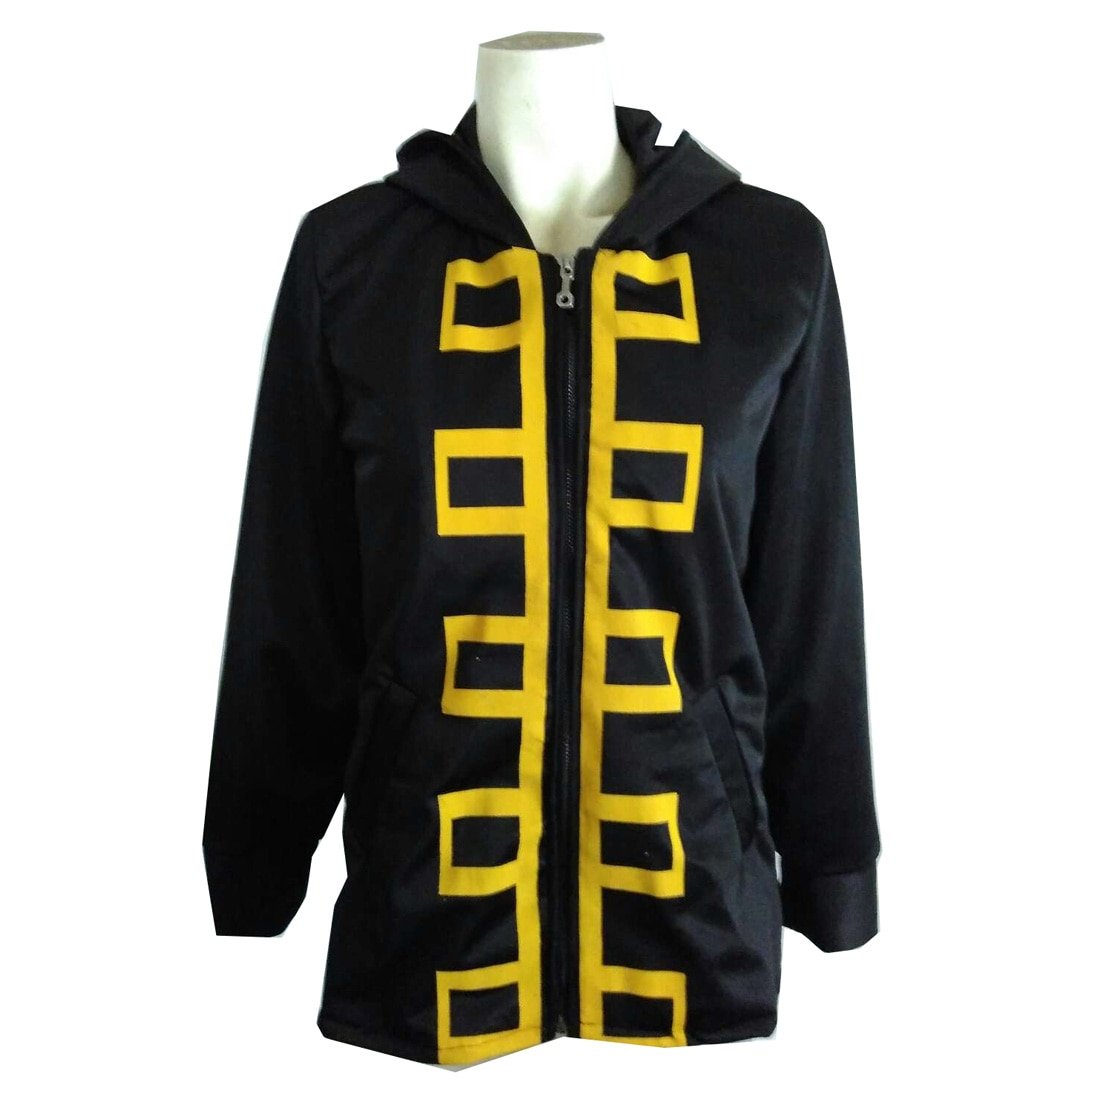 2021 gintama cosplay shinsengumi traje prata alma okita sougo uniformes ternos trajes anime cosplay traje